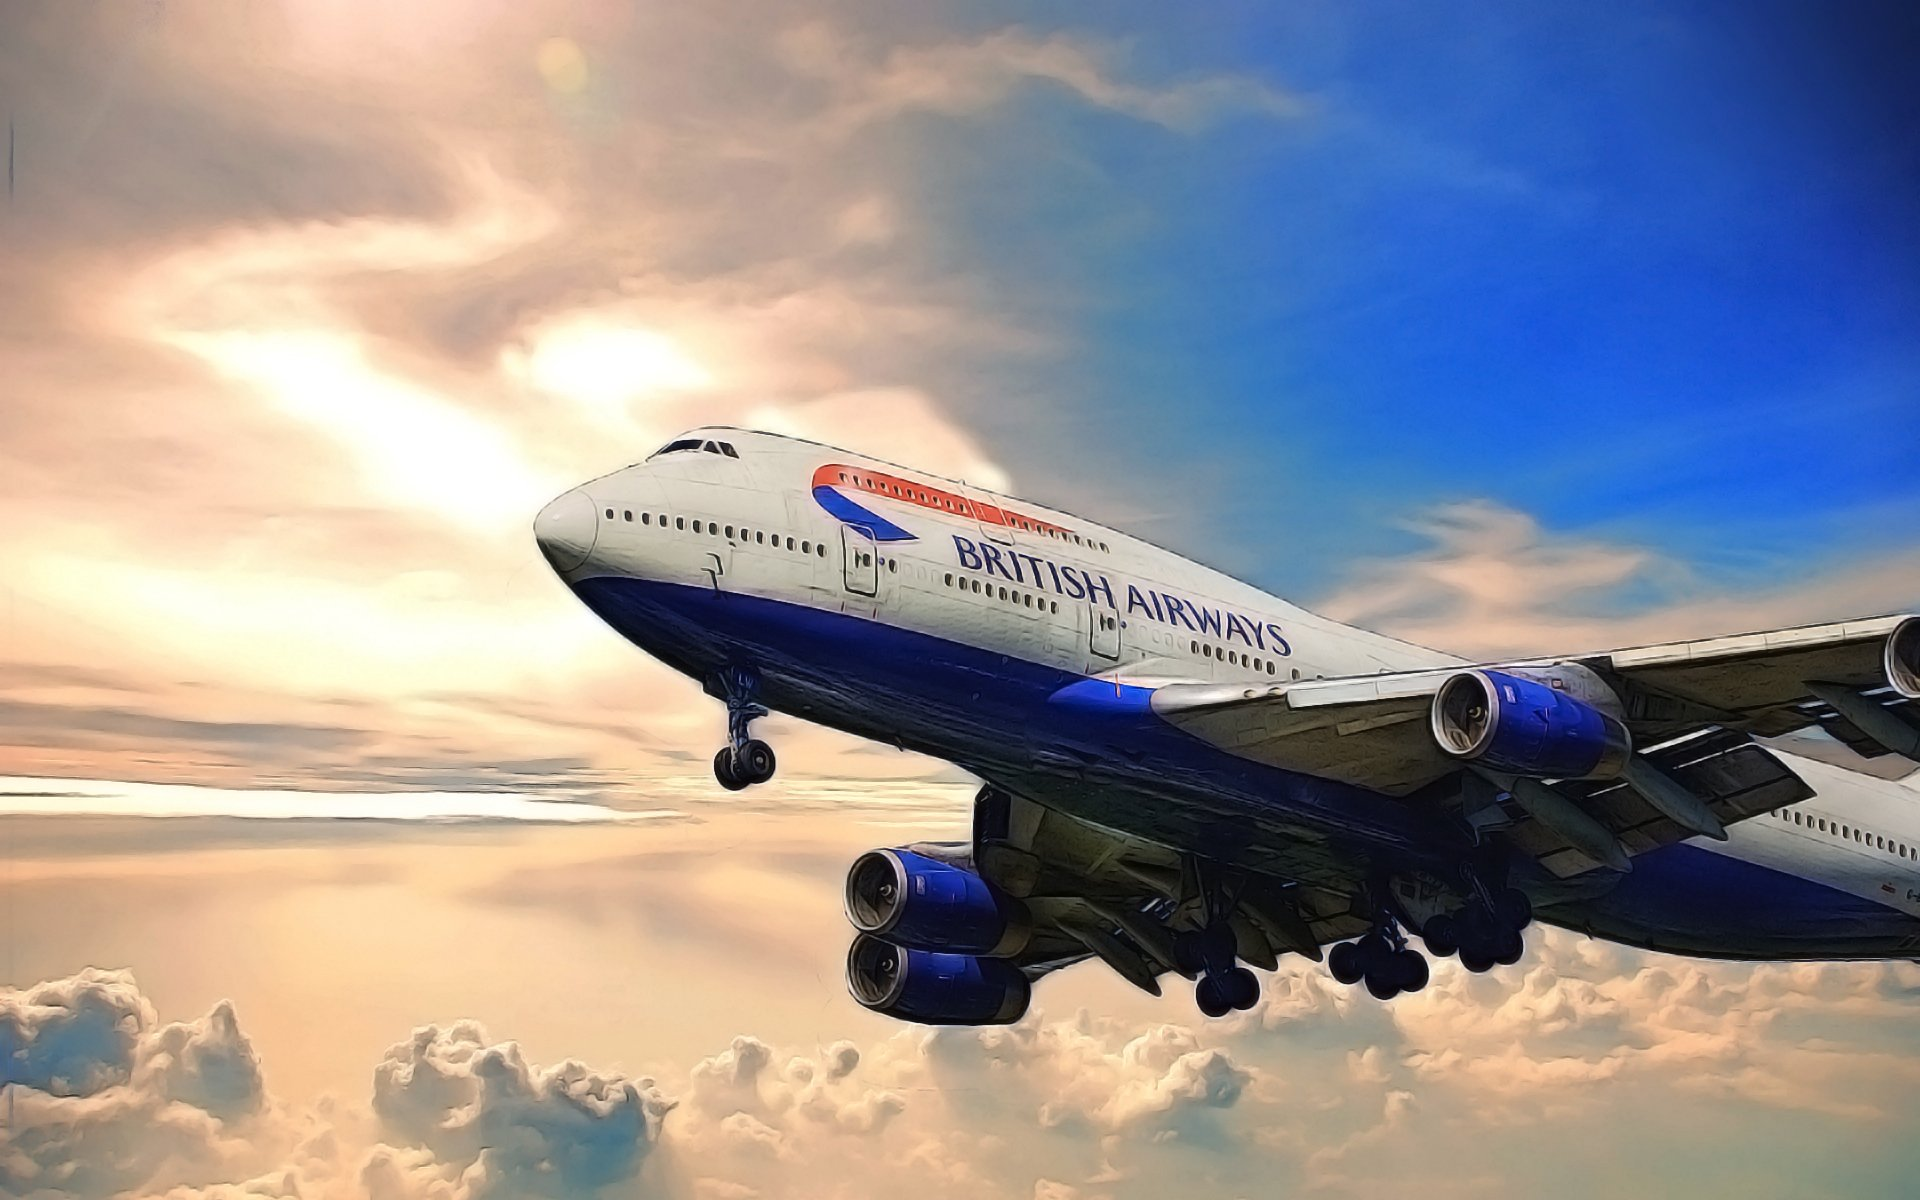 Обои 8, Самолёт, люфтганза, Lufthansa, 747, boeing, боинг, пассажирский. Авиация foto 13